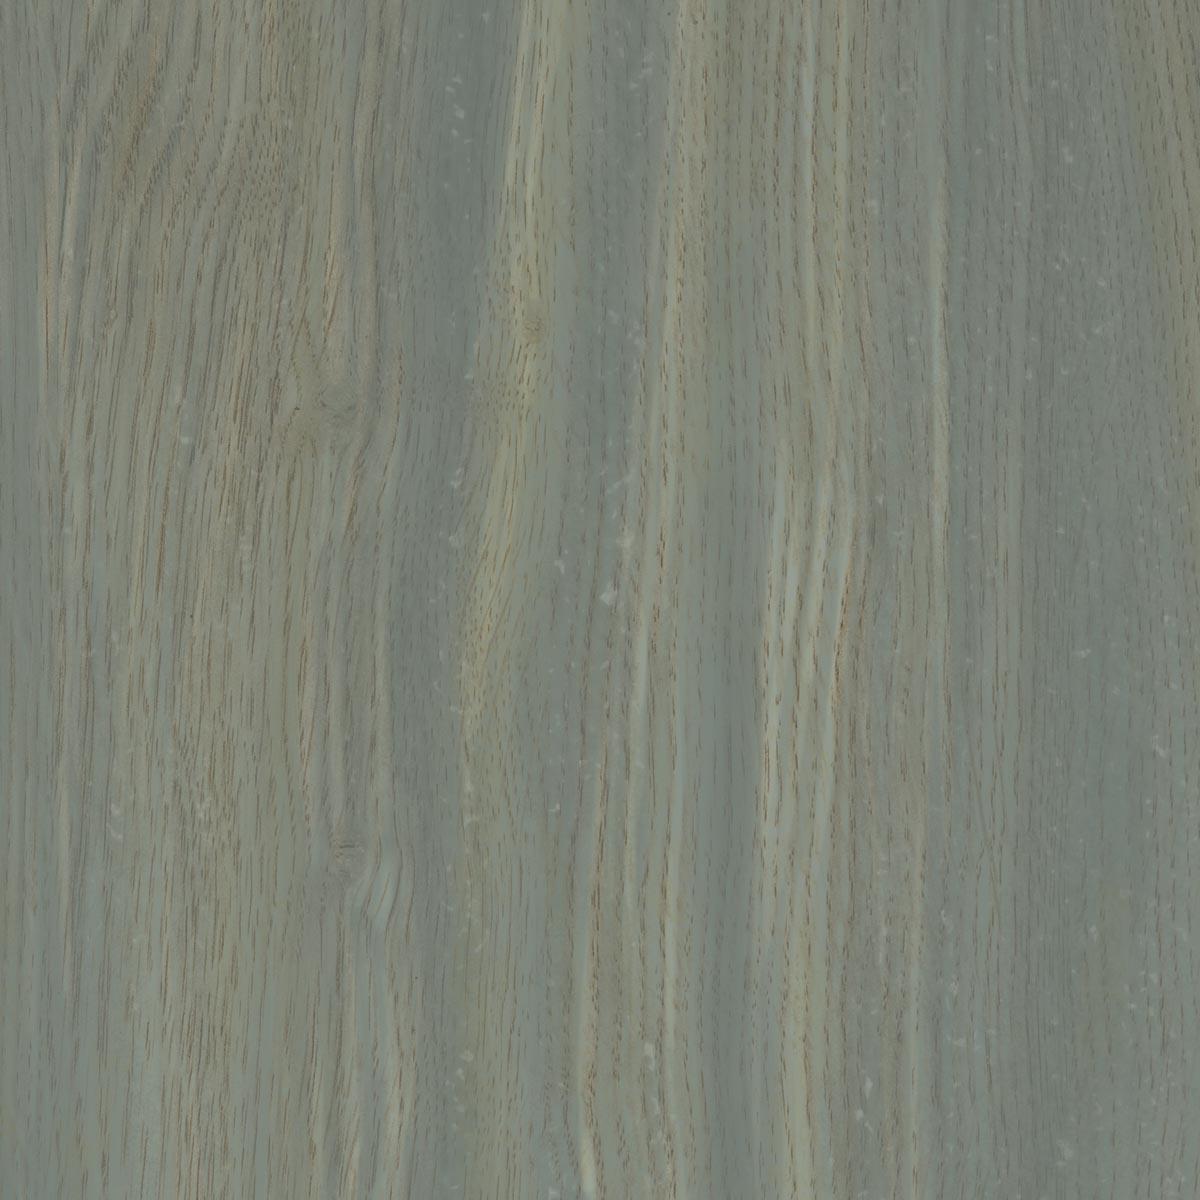 FolkArt ® Pickling Wash™ - Stormy Sky, 2 oz. - 5825